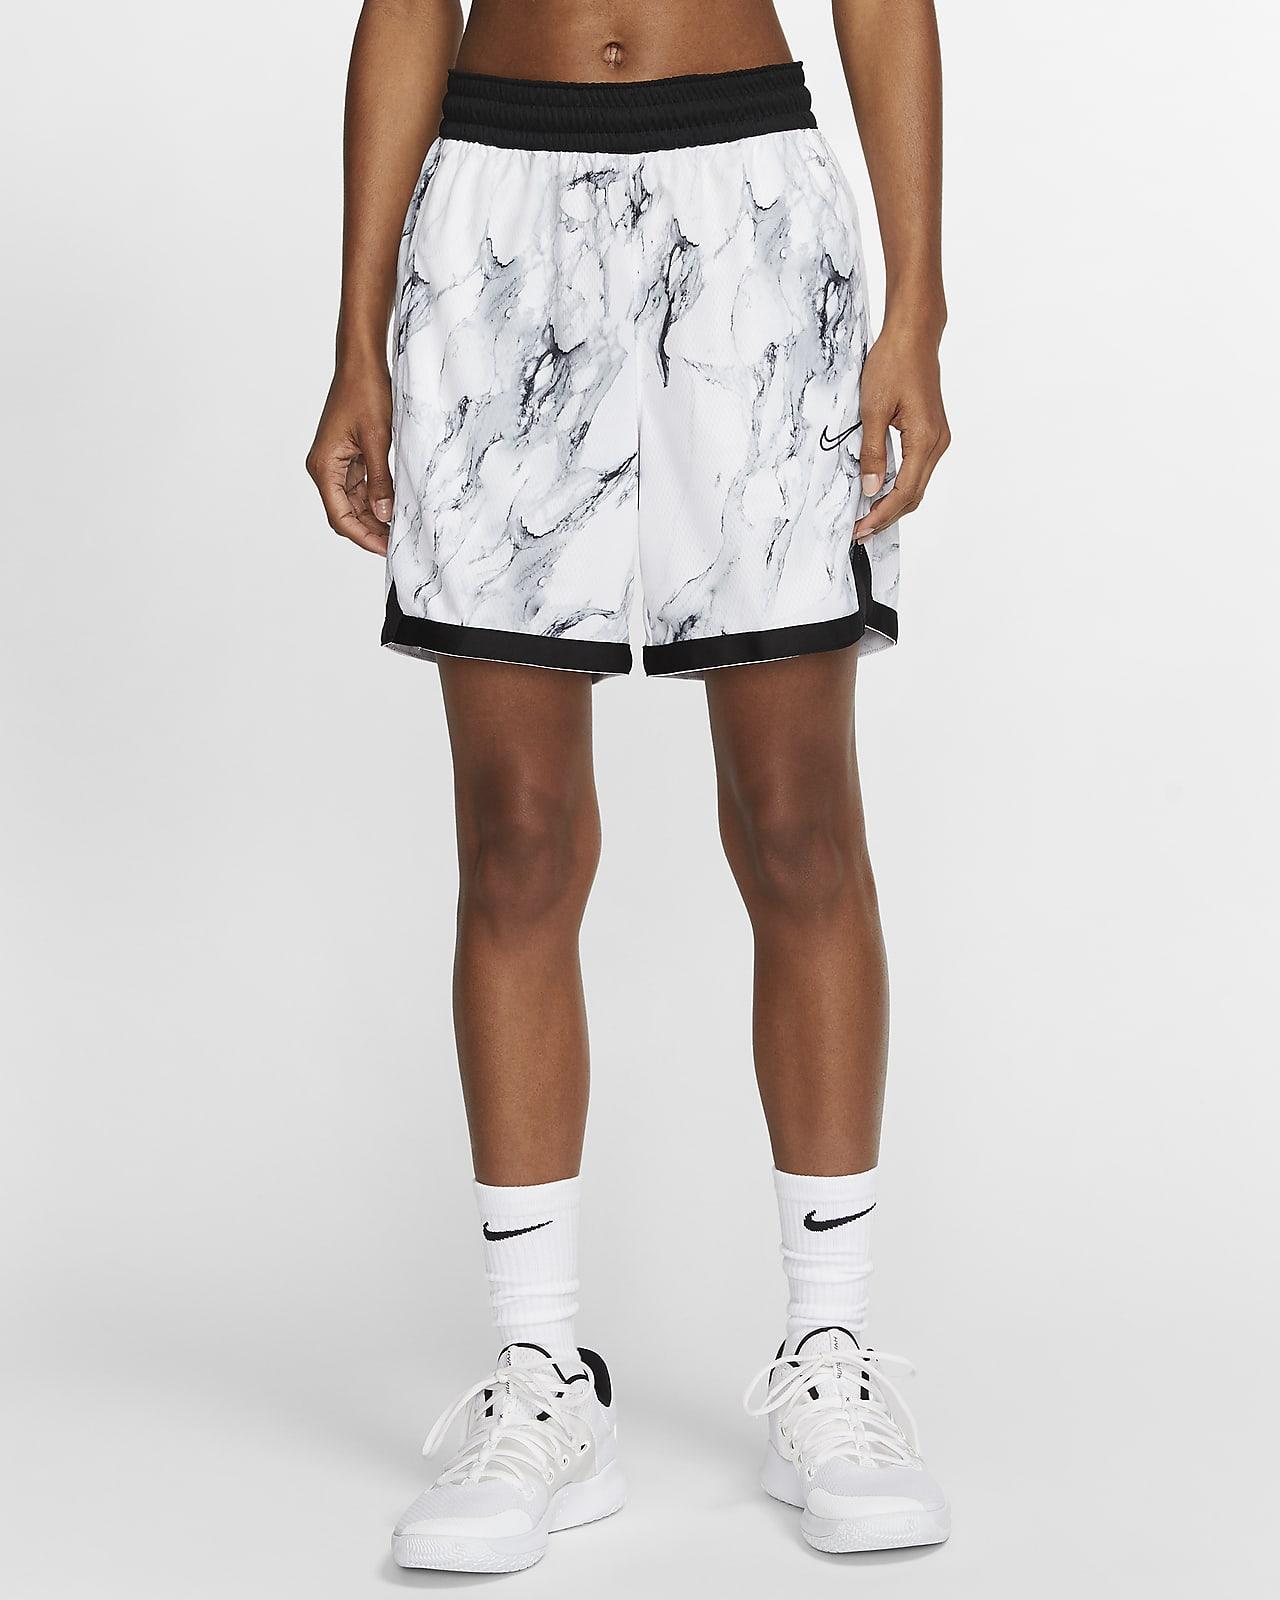 Nike Dri-FIT Women's Basketball Shorts